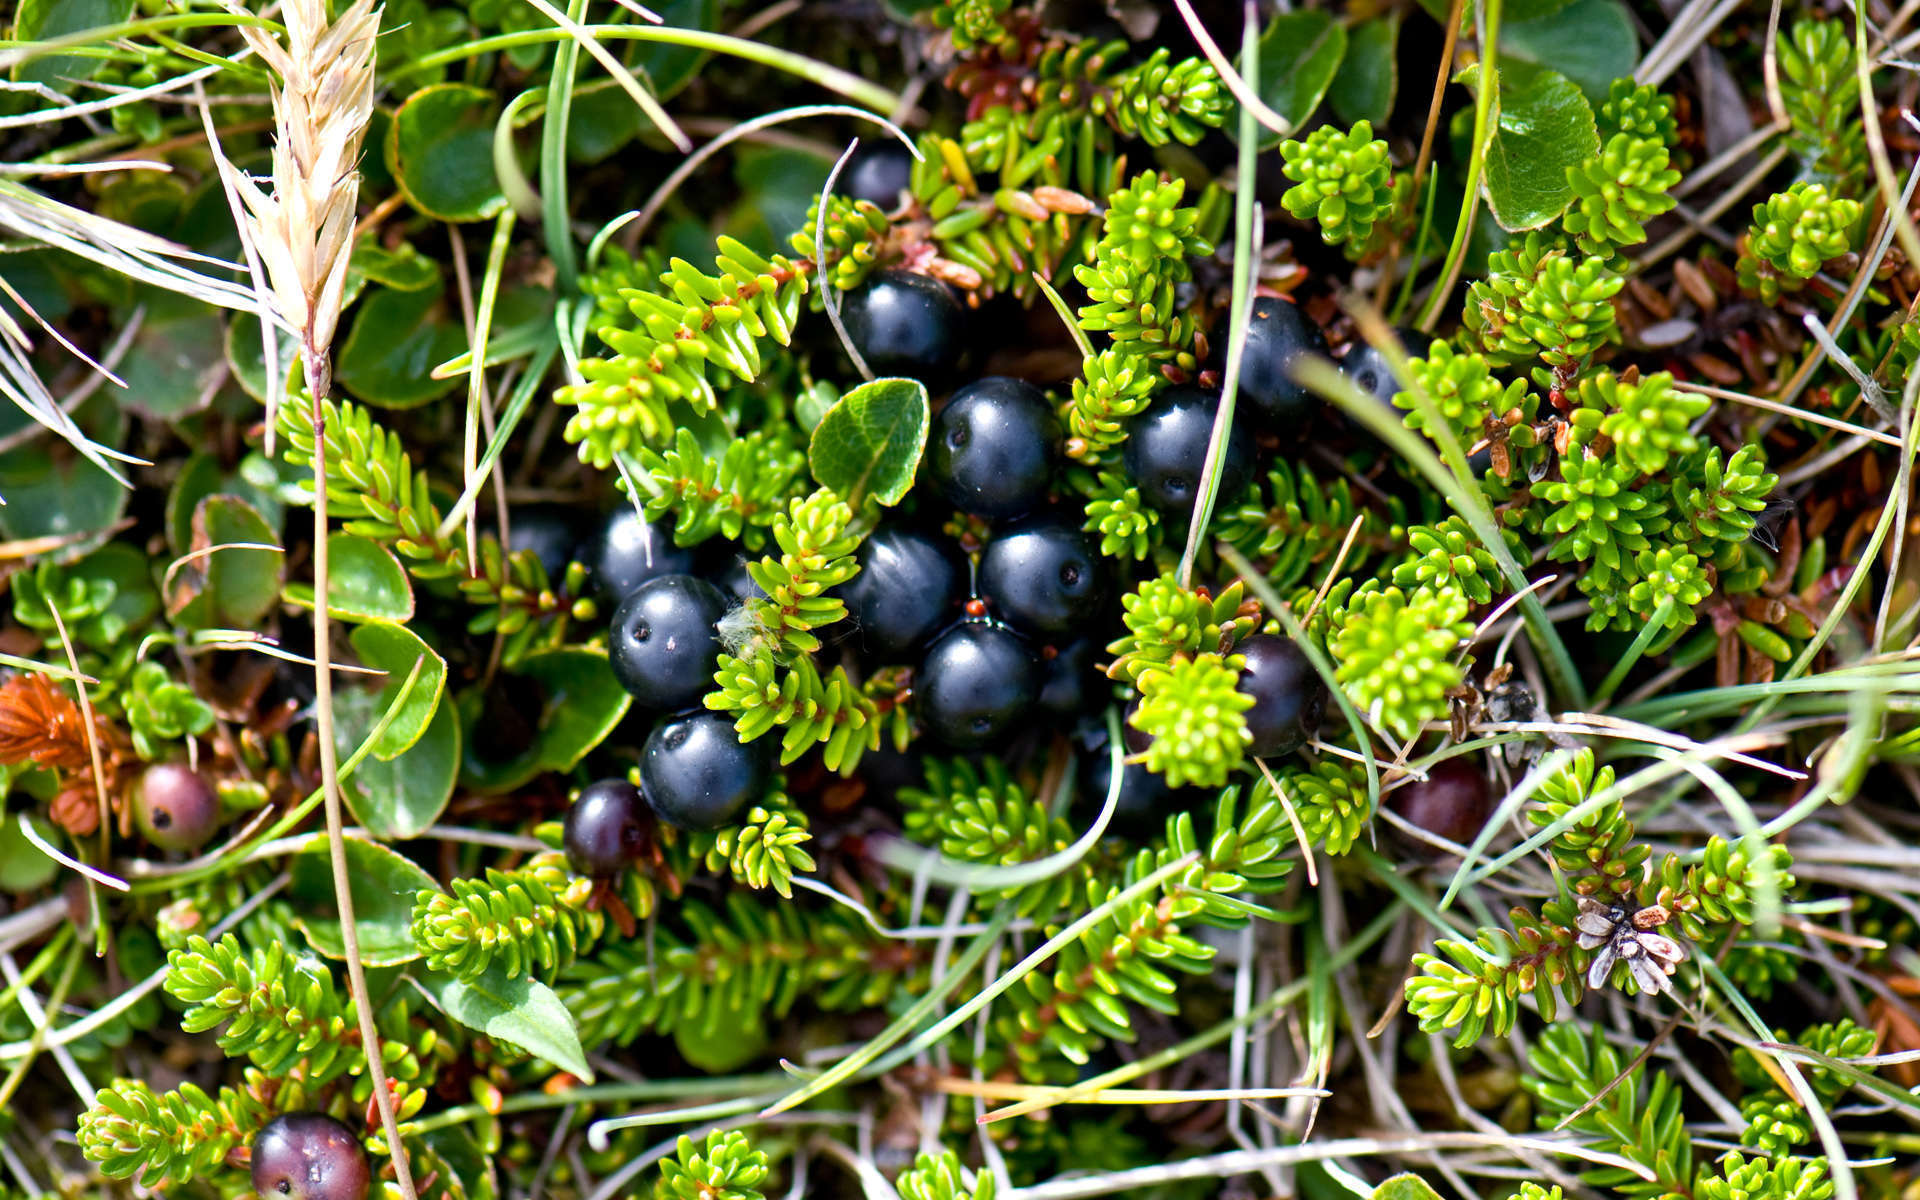 Camarine noire (Crédits: Thomas Quine - Flickr)